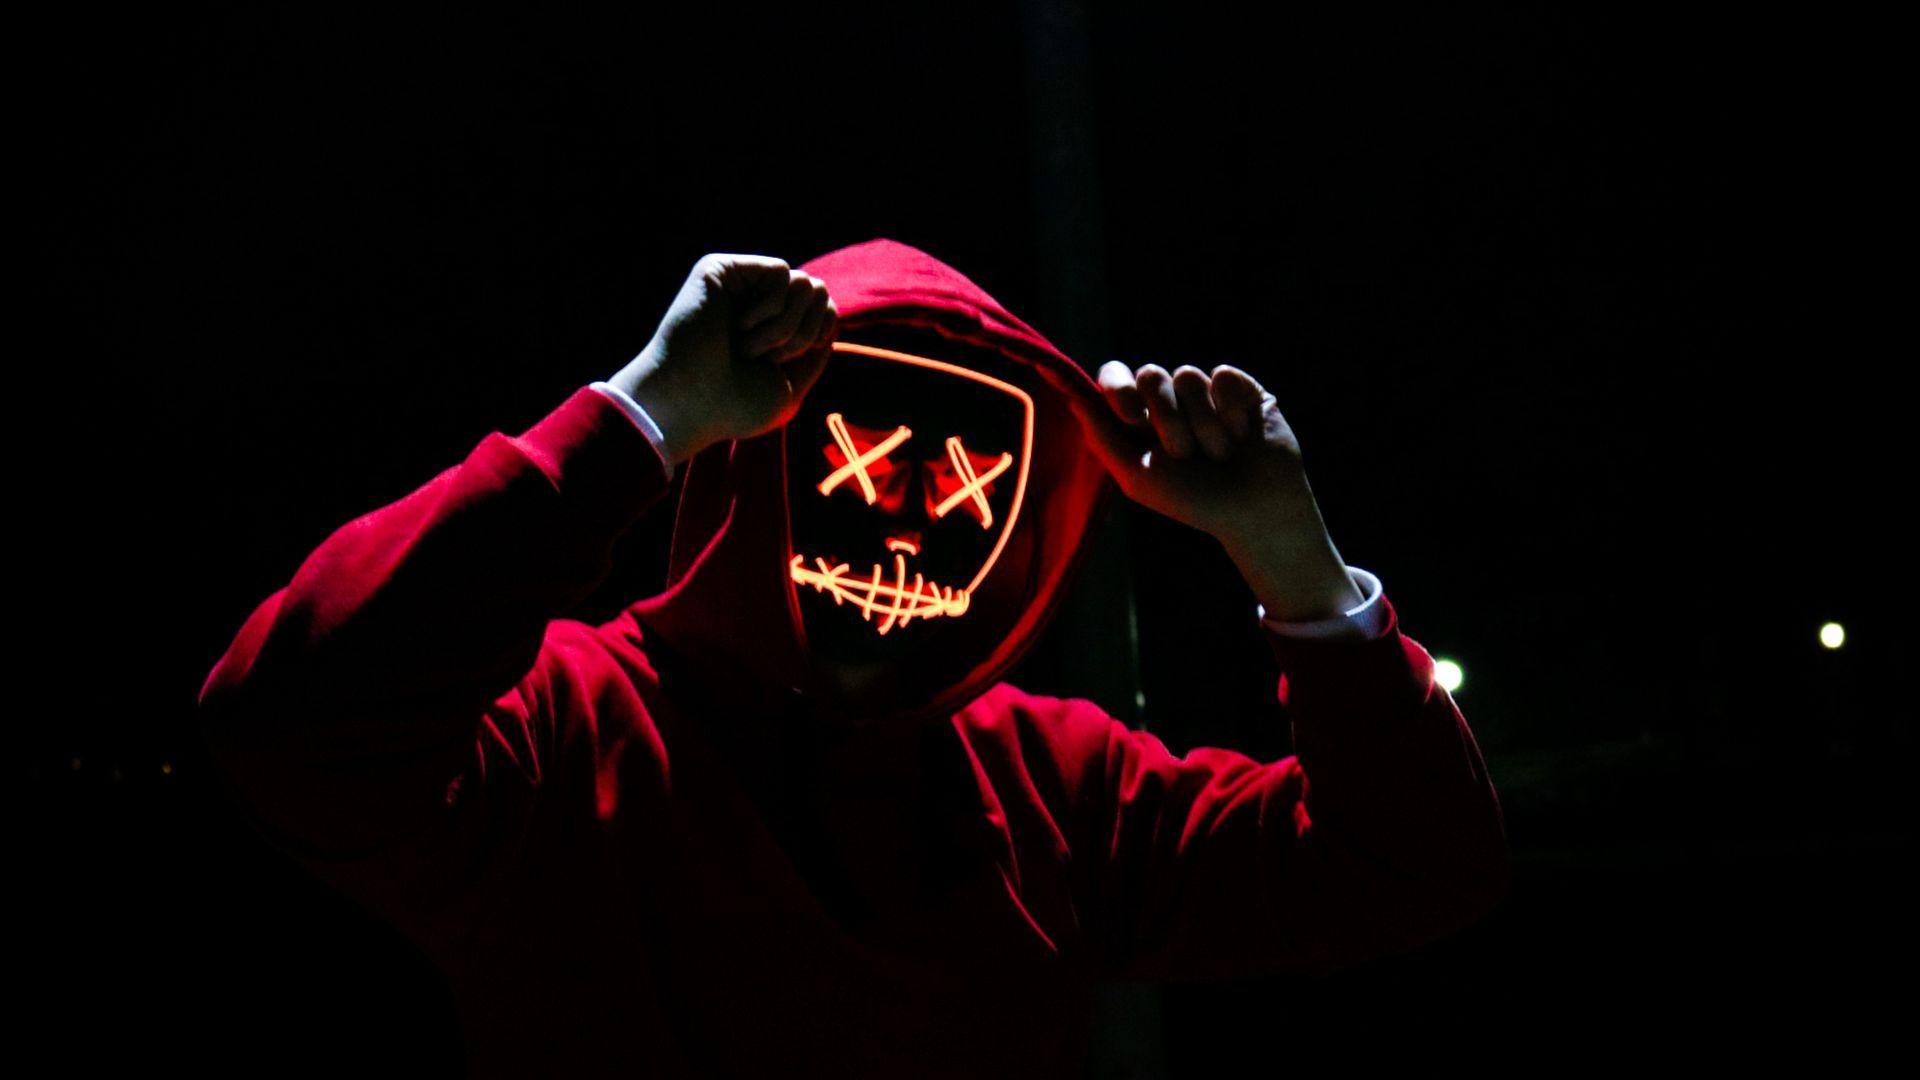 Man Wearing Red Hoodie Scary Hd Wallpaper Black Wallpaper Red Hoodie Free Stock Photos